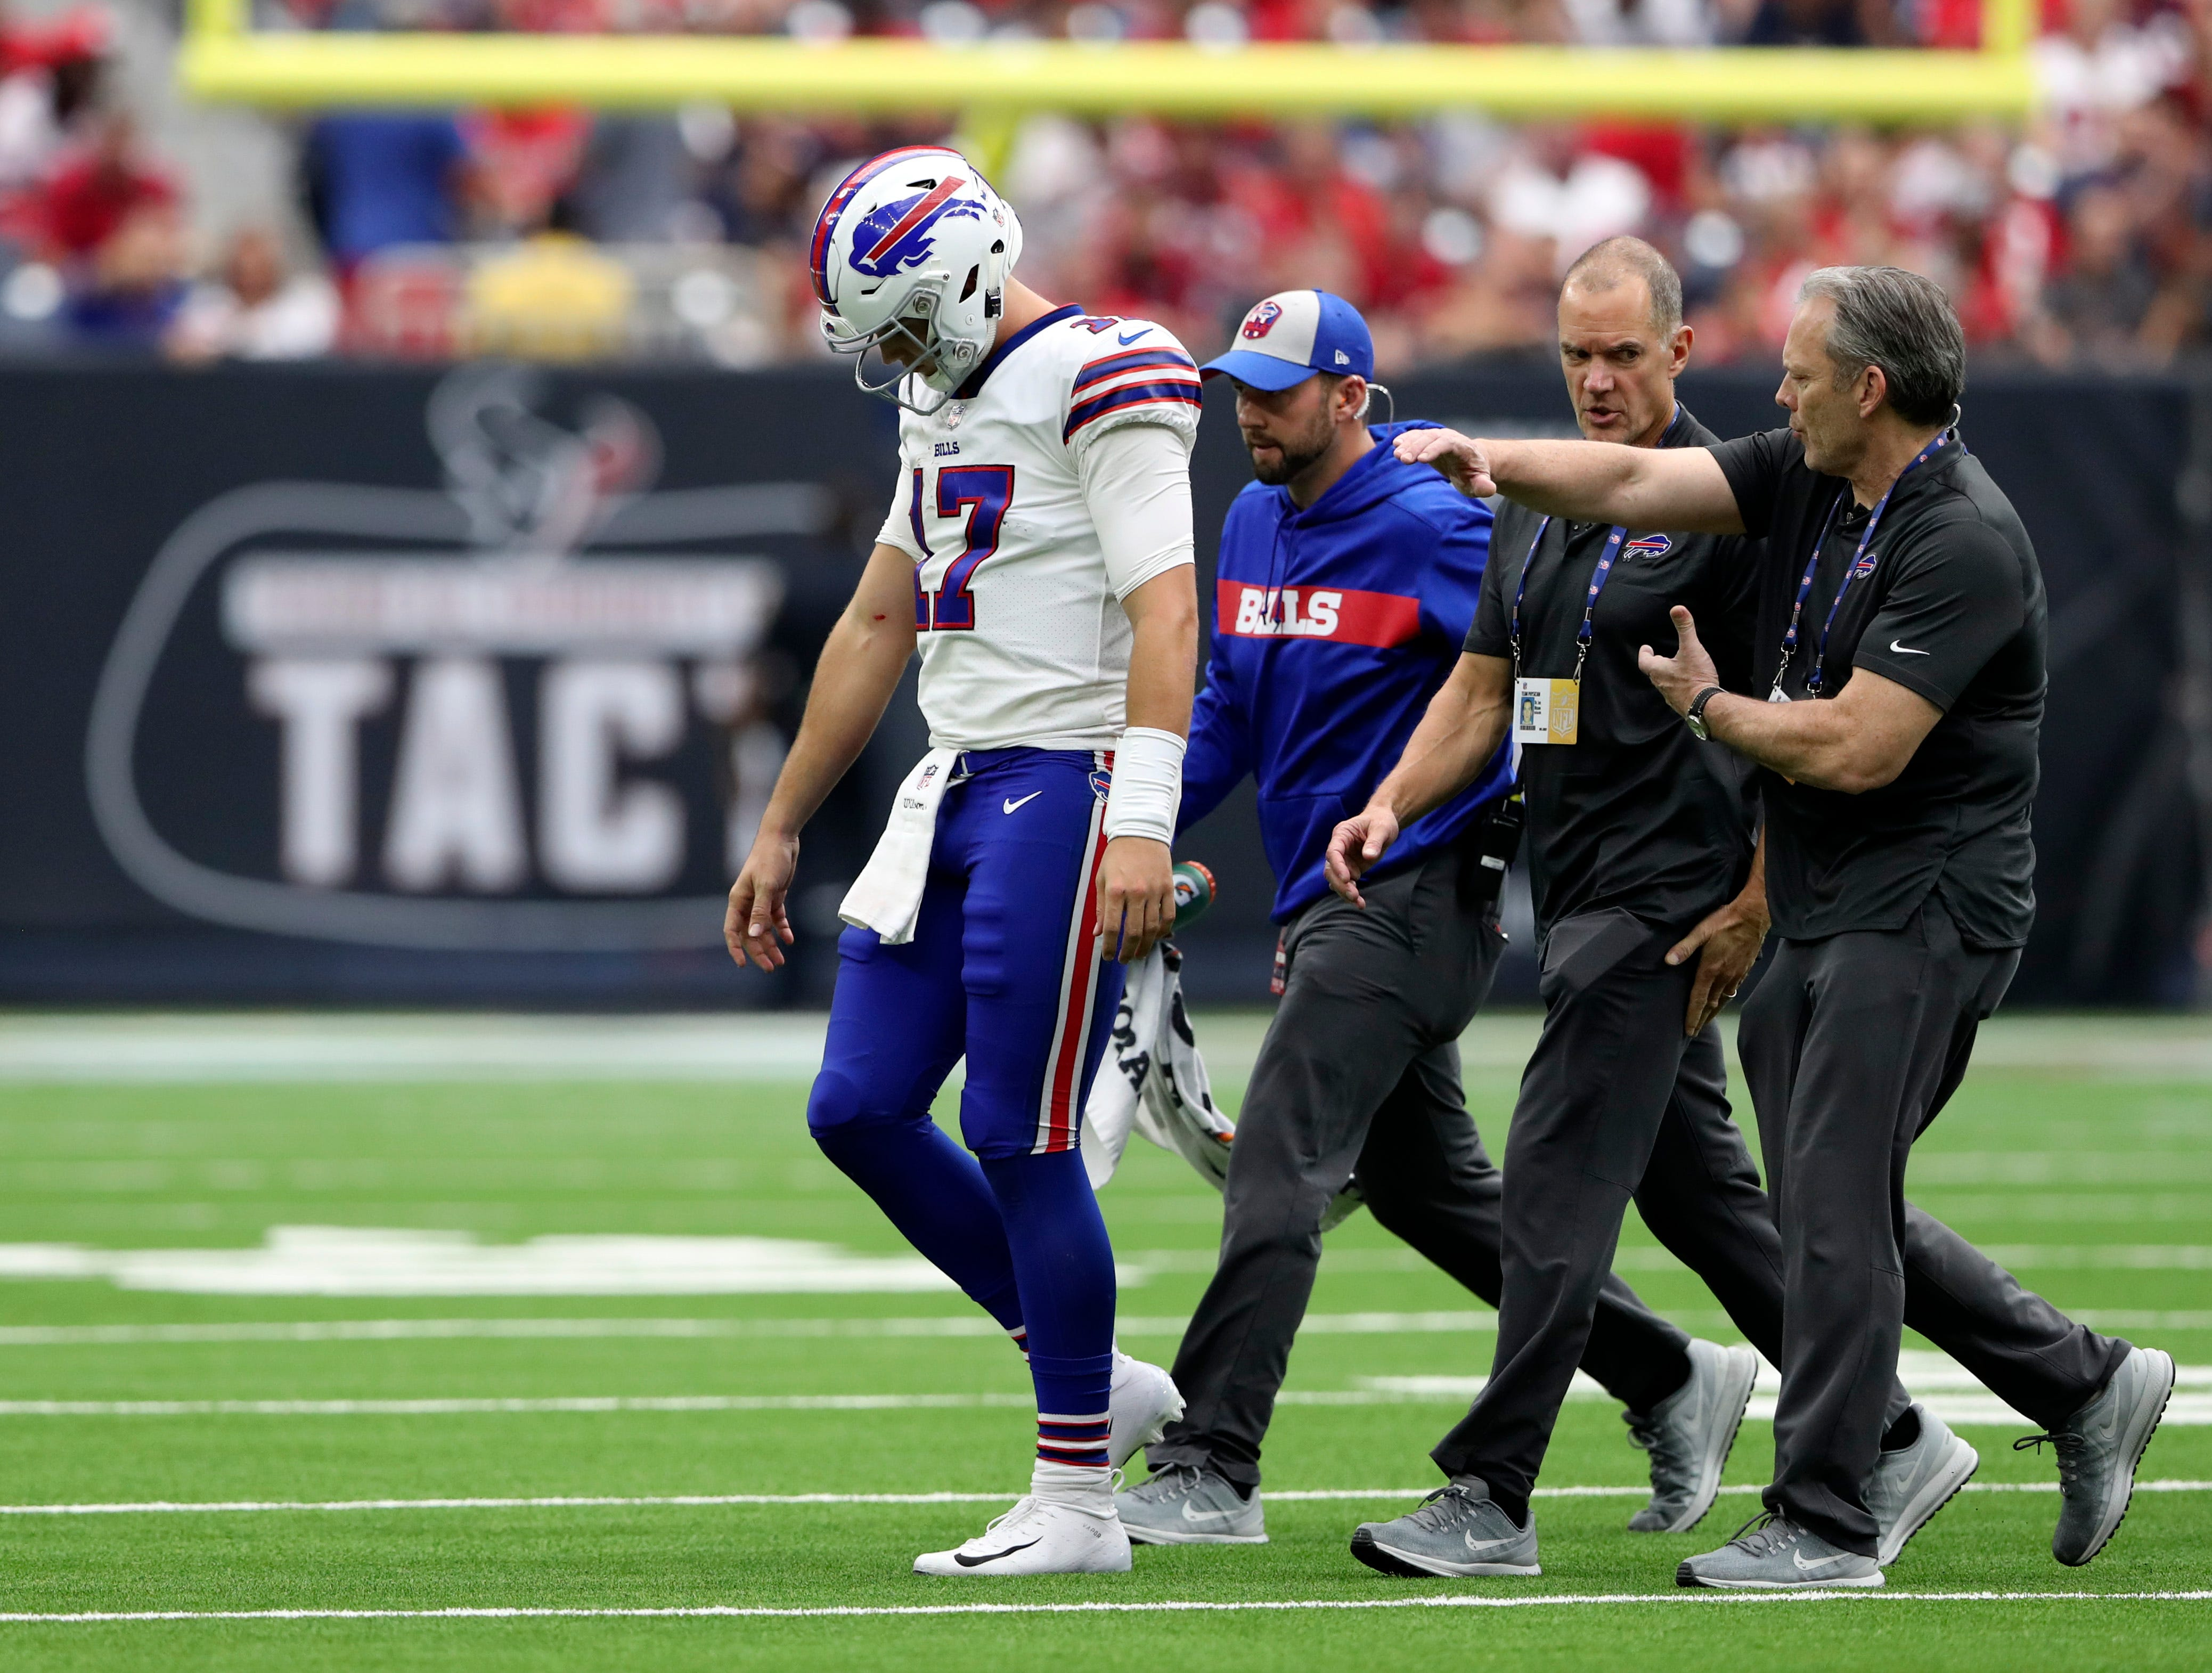 Oct 14, 2018; Houston, TX, USA; Buffalo Bills quarterback Josh Allen (17) walks off the field injured during the second half against the Houston Texans at NRG Stadium. Mandatory Credit: Kevin Jairaj-USA TODAY Sports